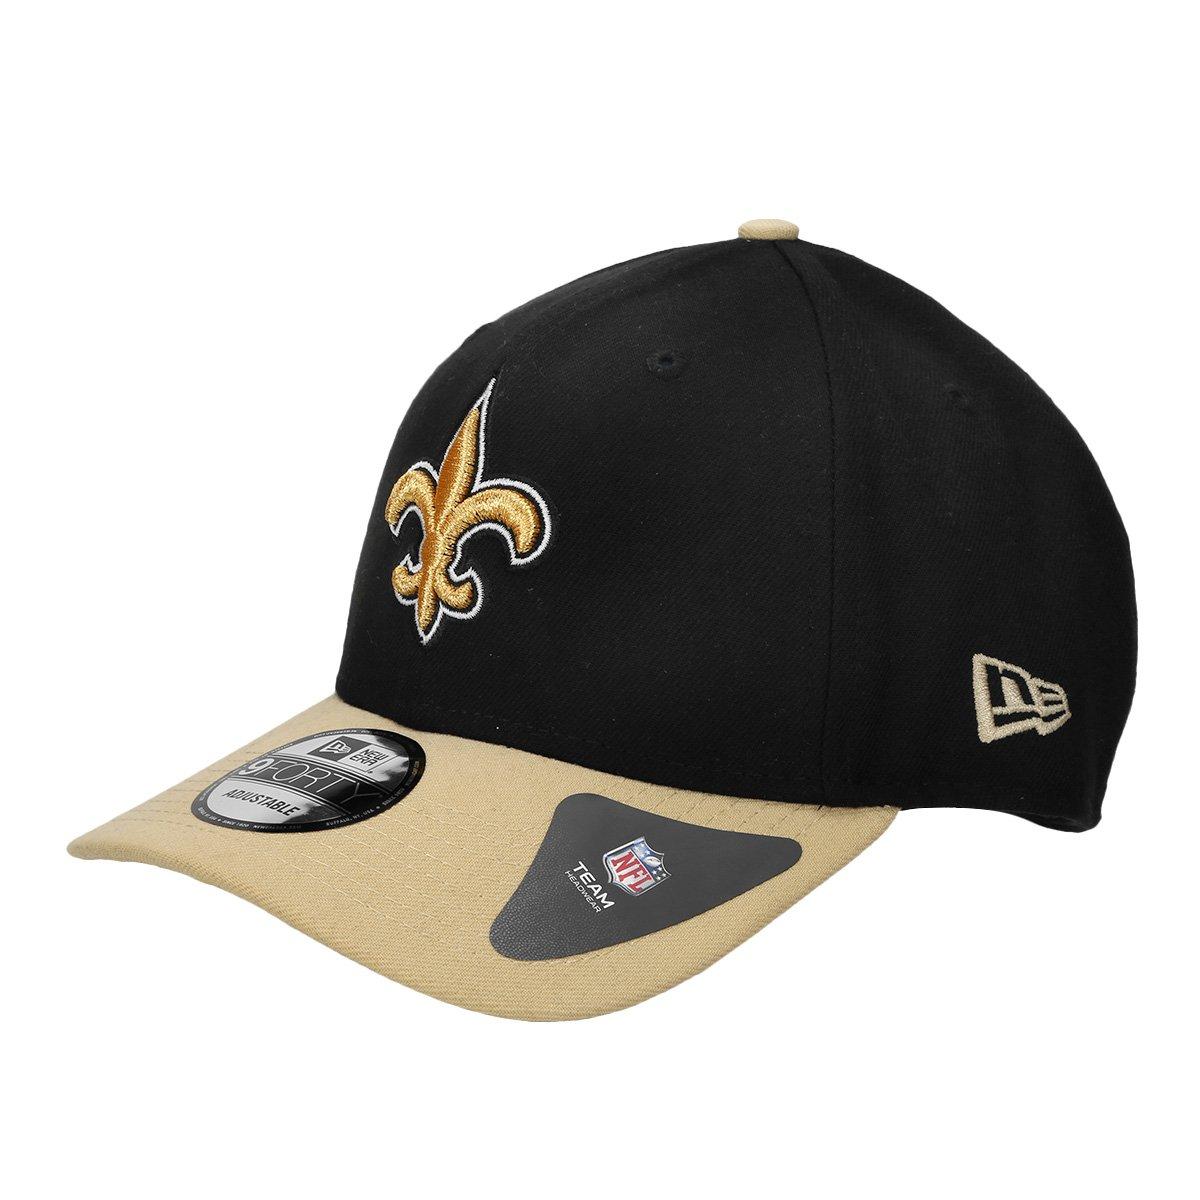 Boné New Orleans Saints New Era Aba Curva NFL 940 Hc Sn Basic - Preto e  Bege - Compre Agora  1c59ac449cc